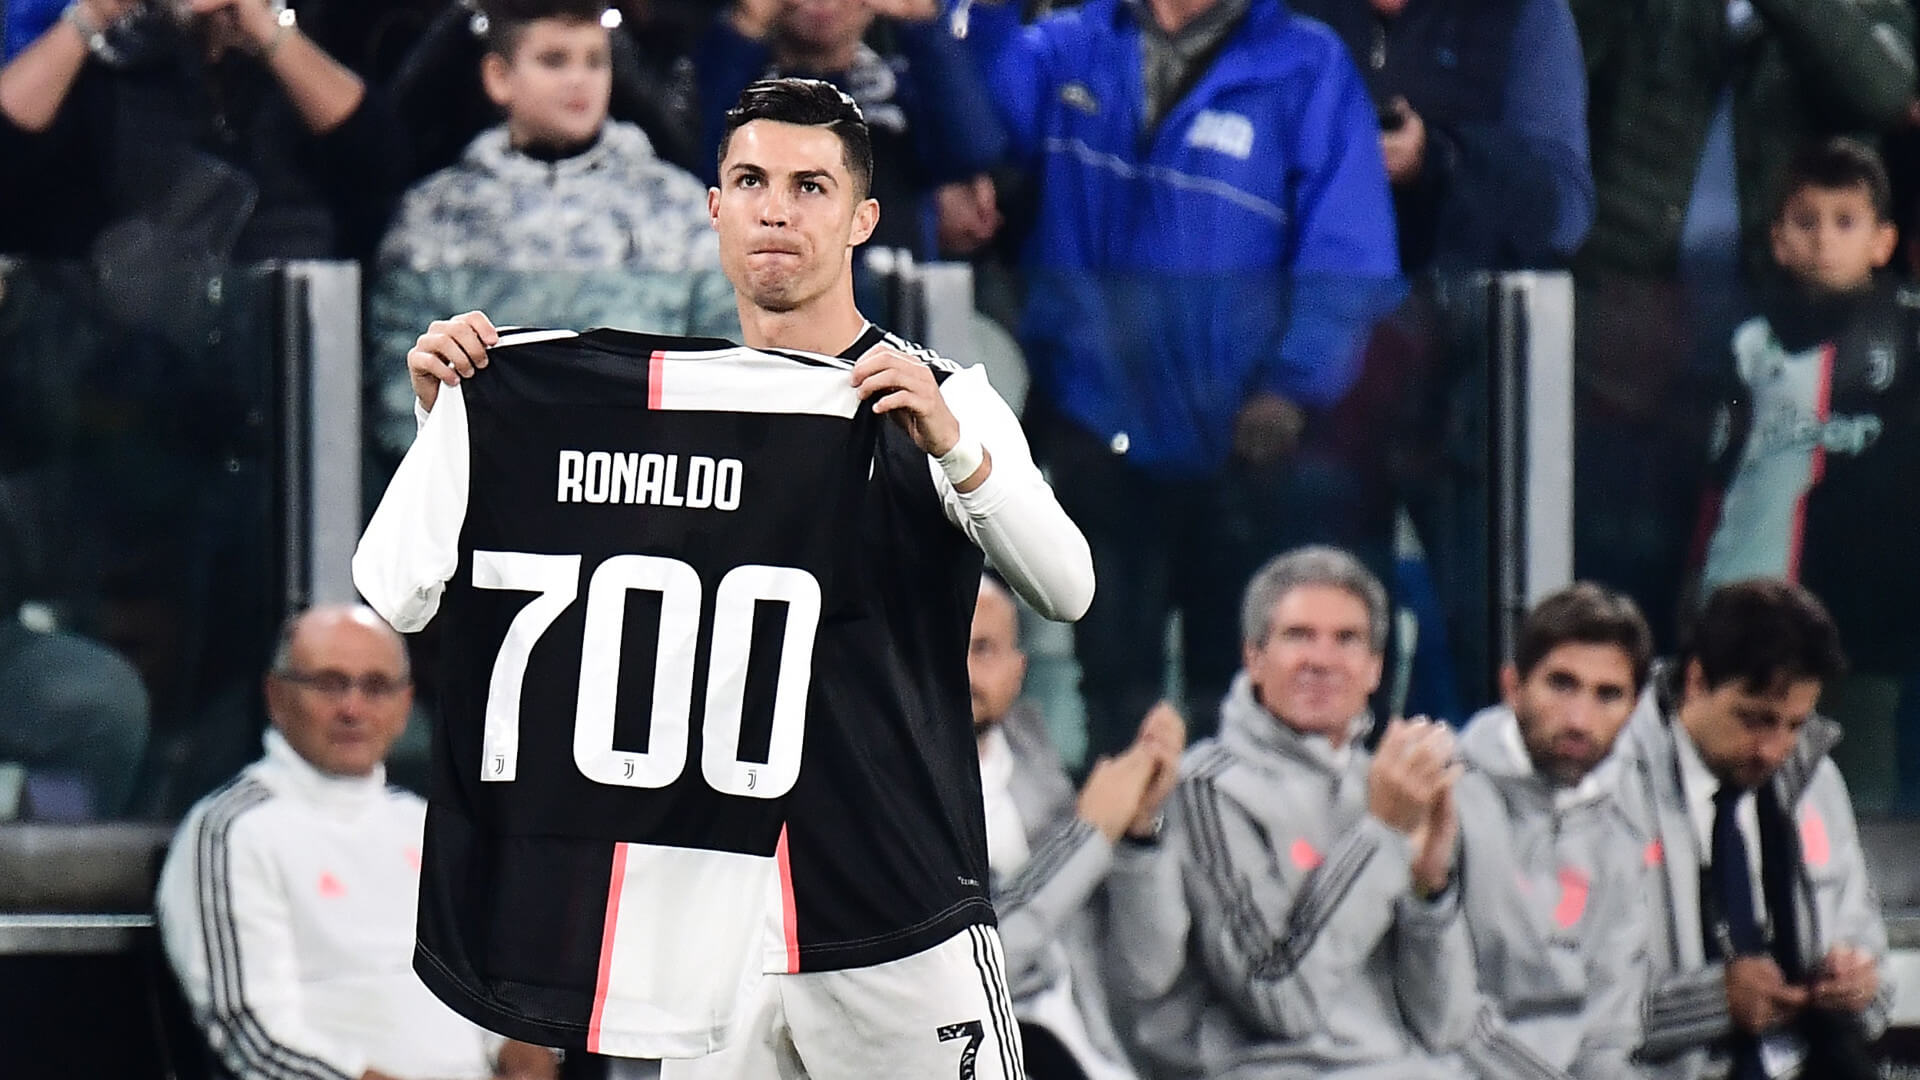 Ronaldo 700 bramka